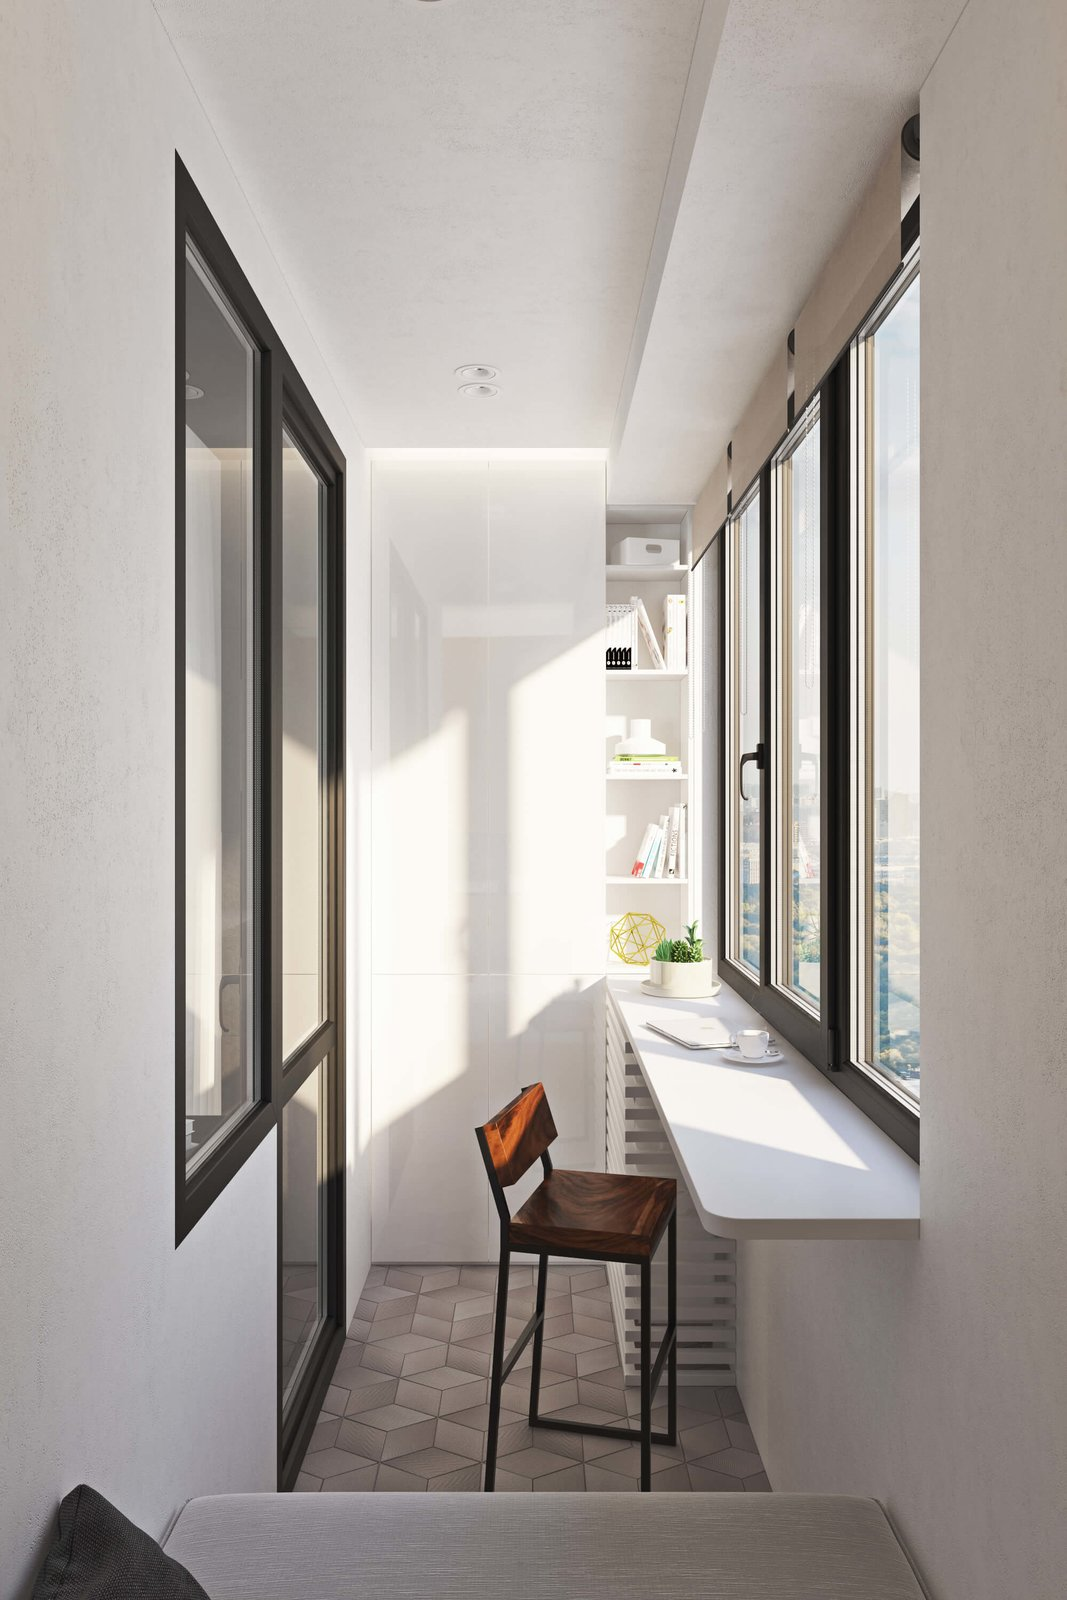 Windows  Contemporary Eco-Style Apartment